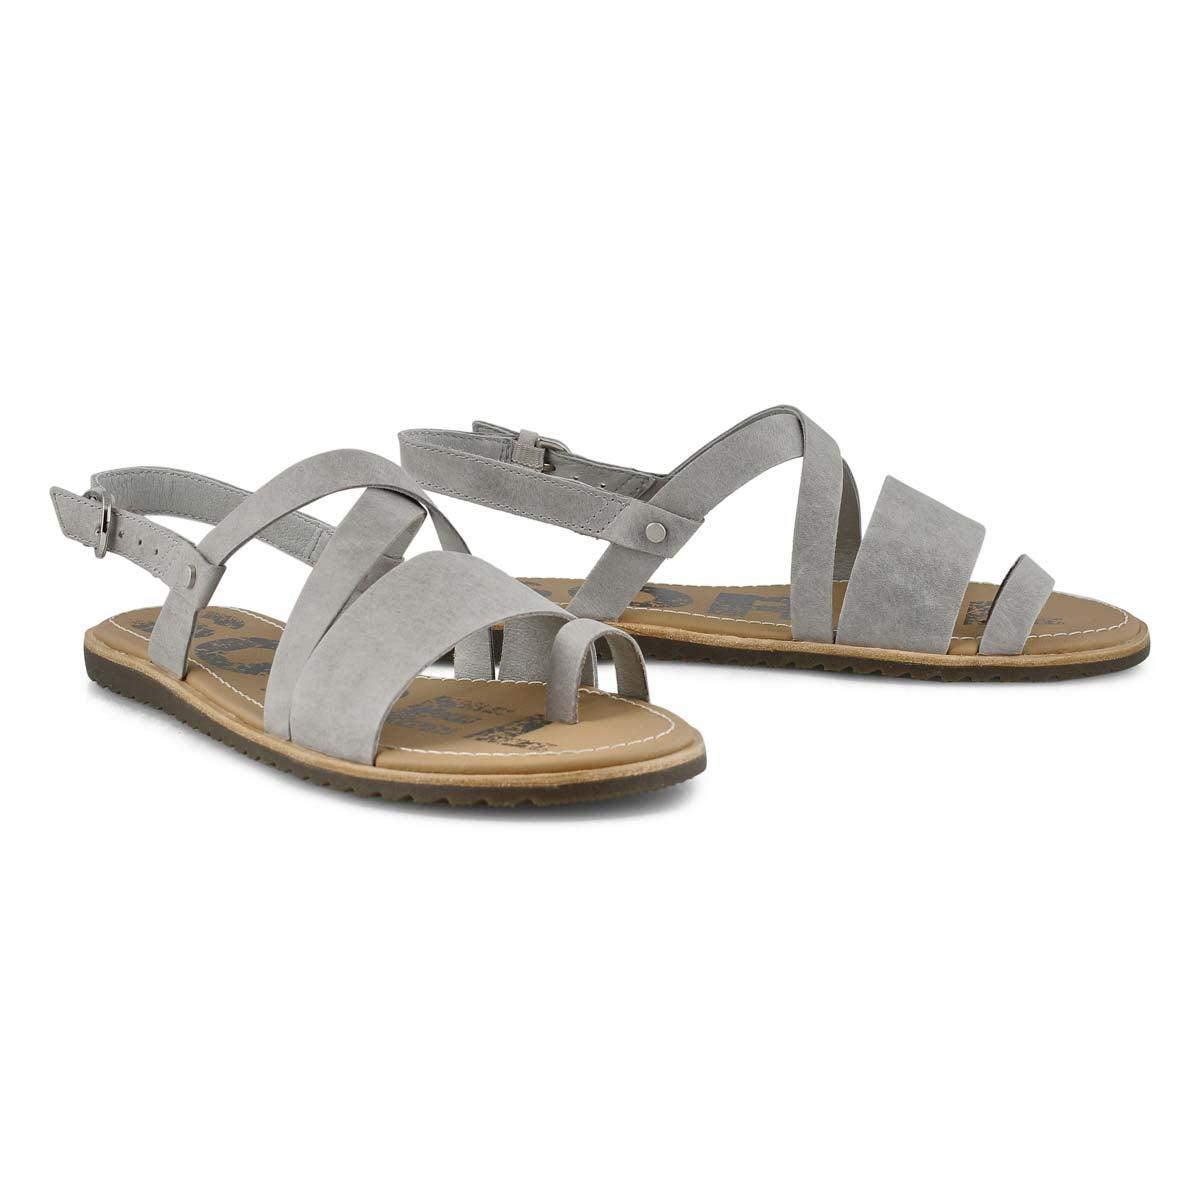 Lds Ella Criss Cross dove casual sandal